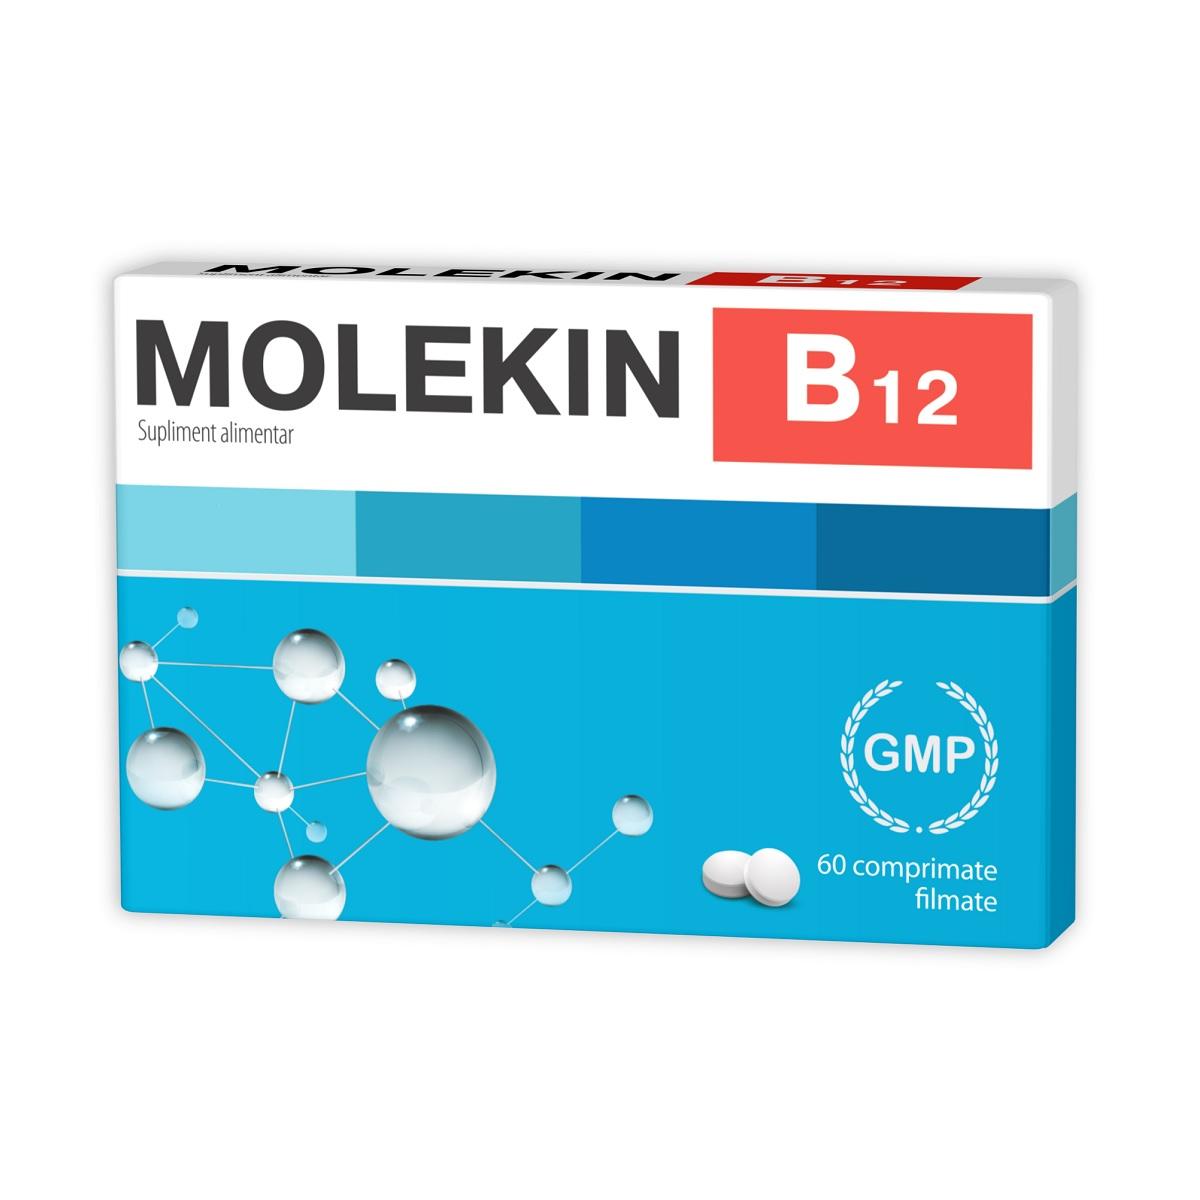 Molekin B12, 60 comprimate filmate, Zdrovit imagine produs 2021